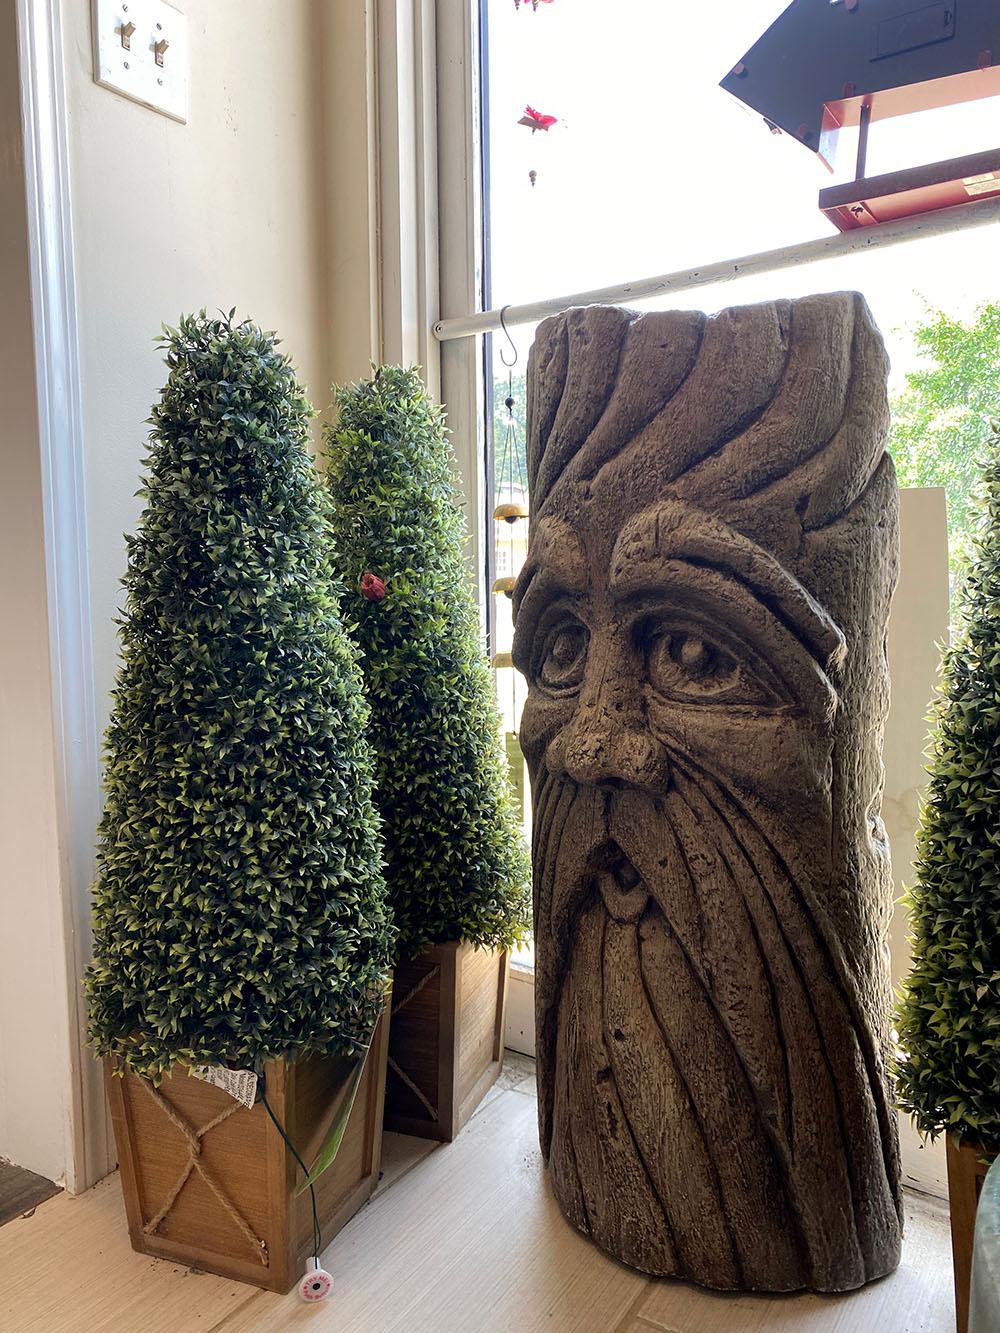 Tree statue at Gemini in Merriam, Kansas